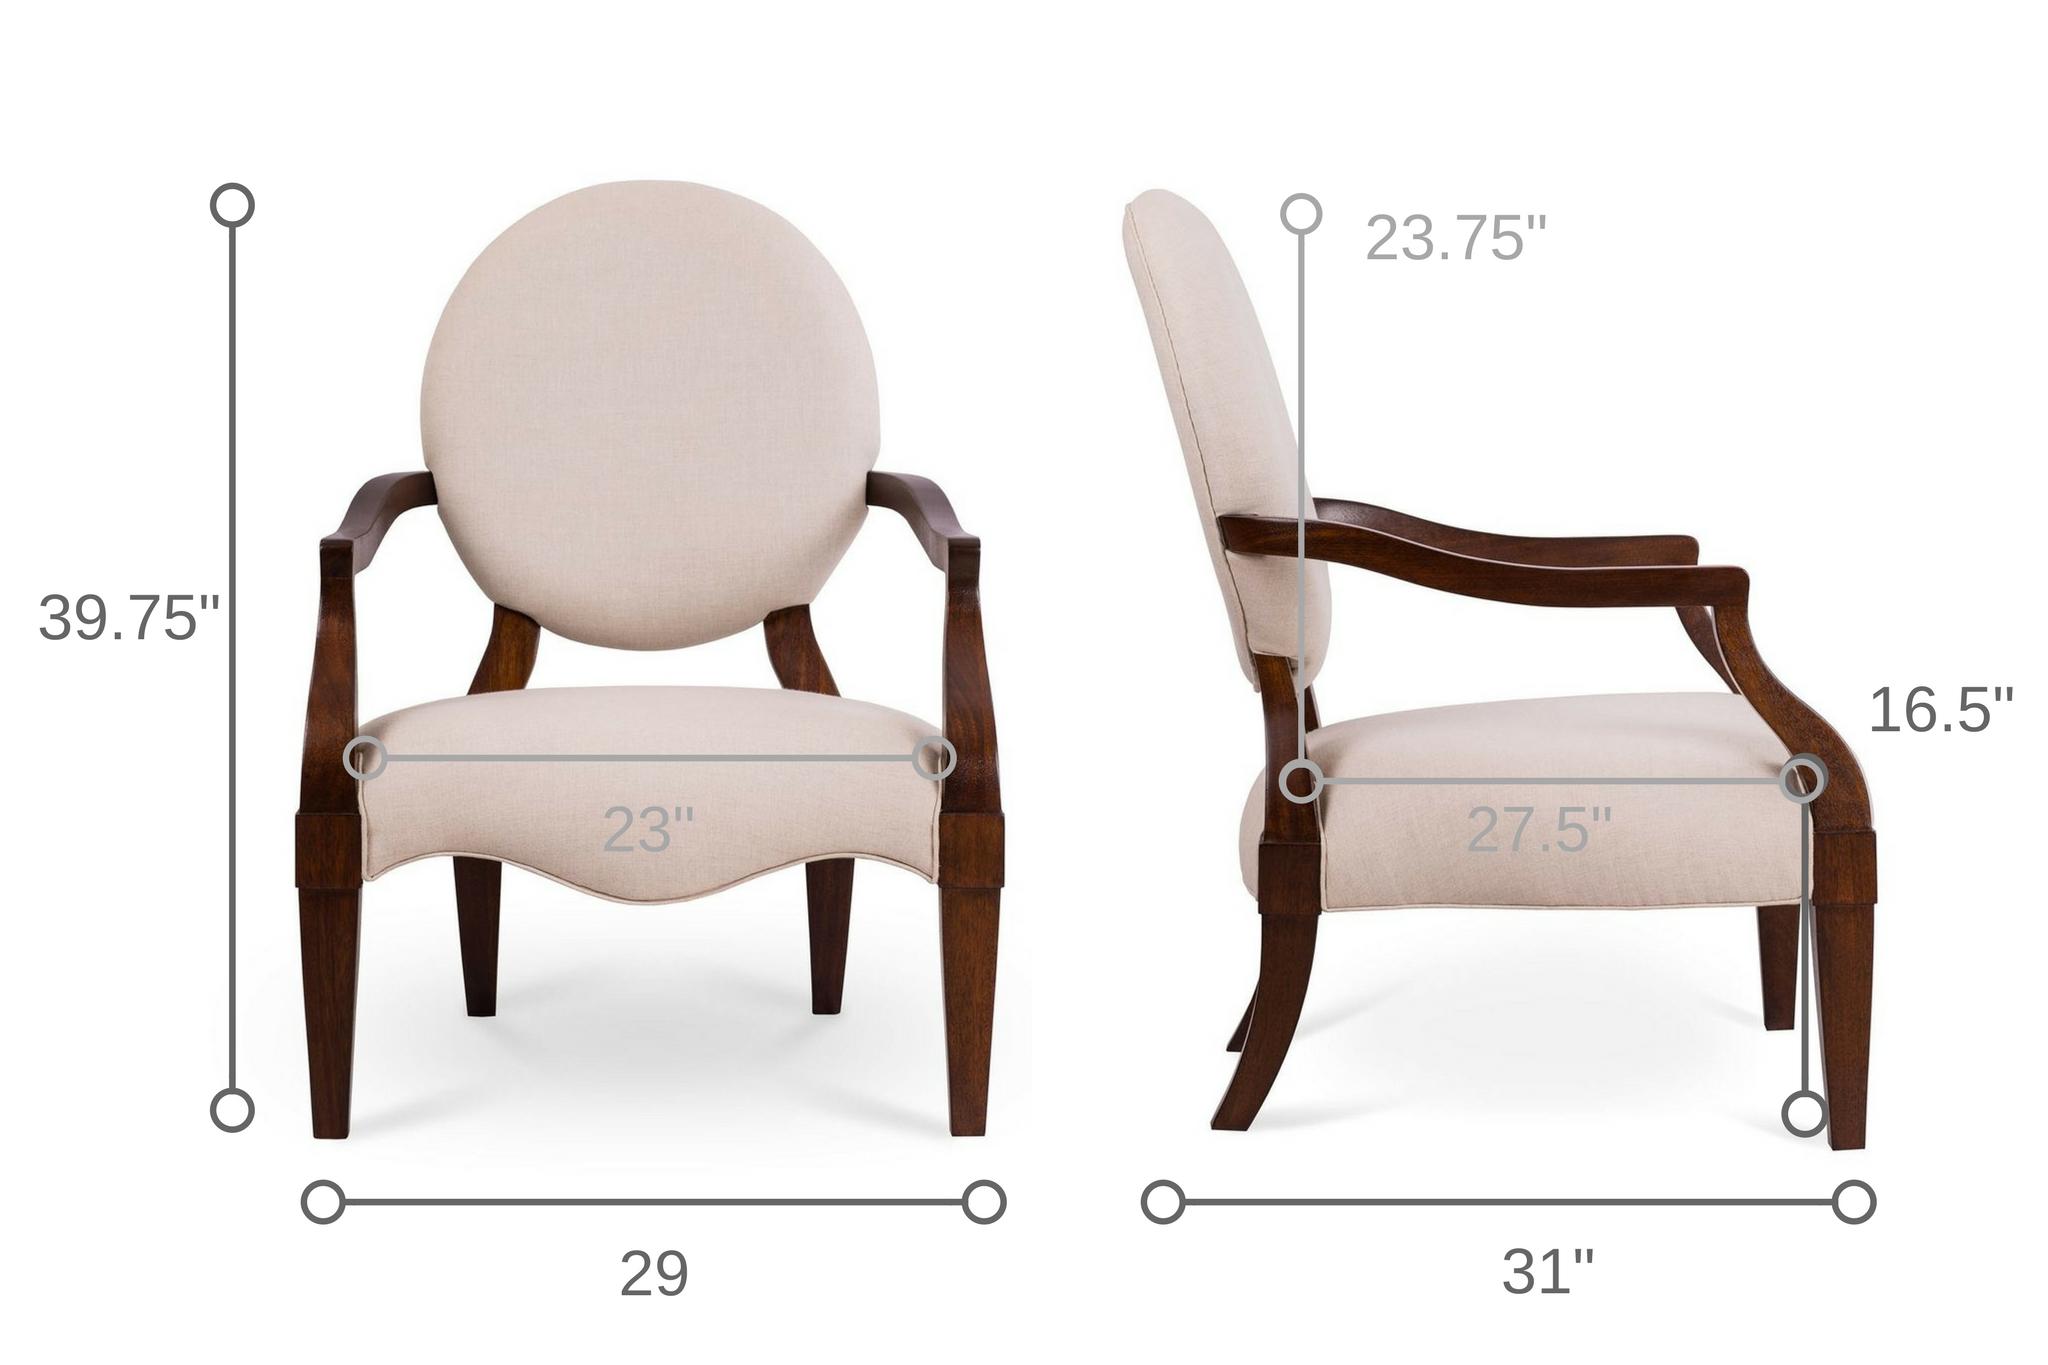 Dowel Furniture Bea Lounge Chair Dimensions